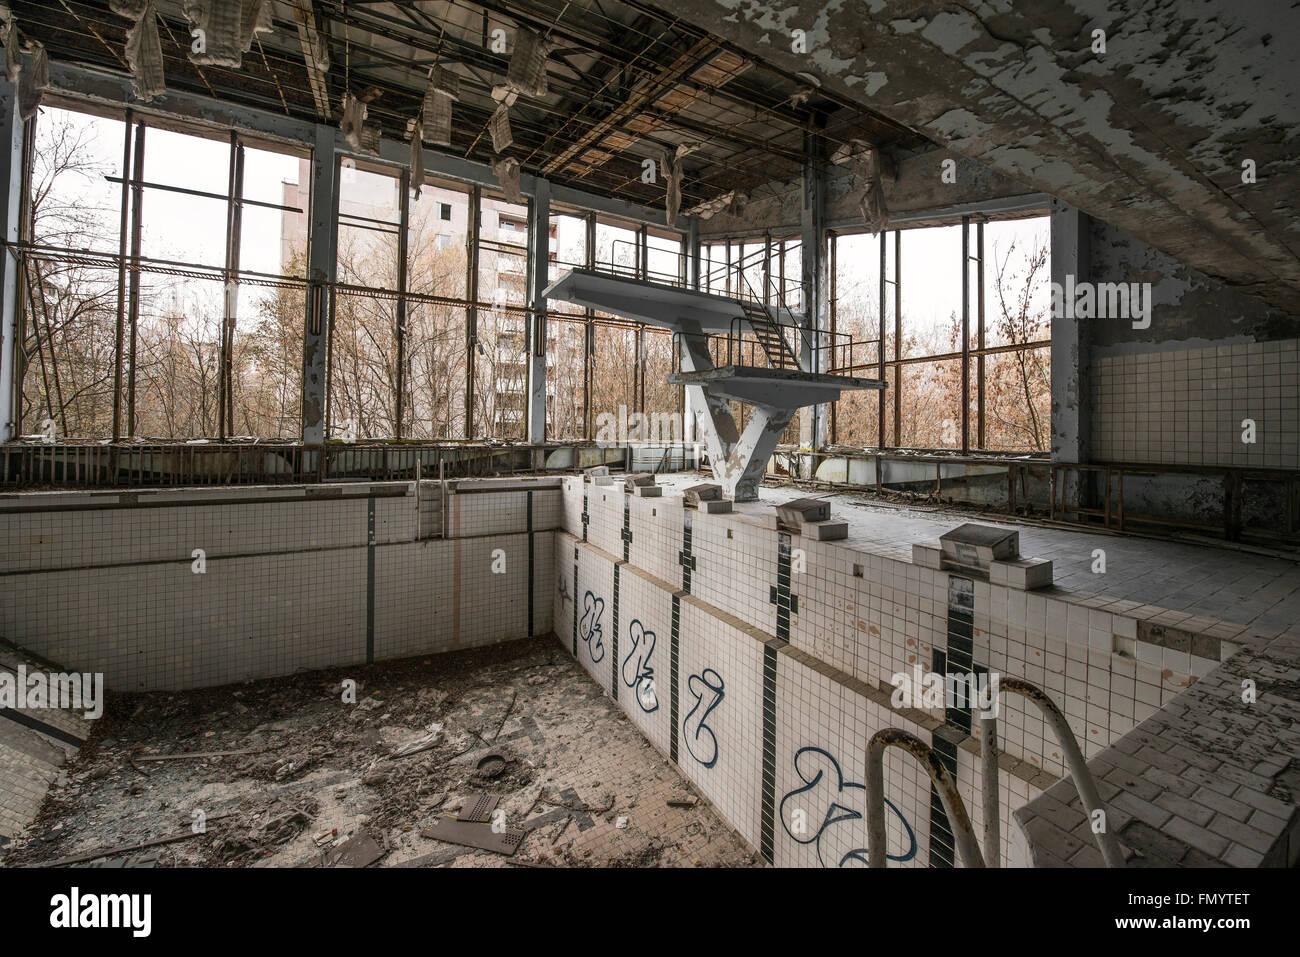 Swimming pool in Pripyat, Chernobyl scene of 1986 nuclear disaster - Stock Image